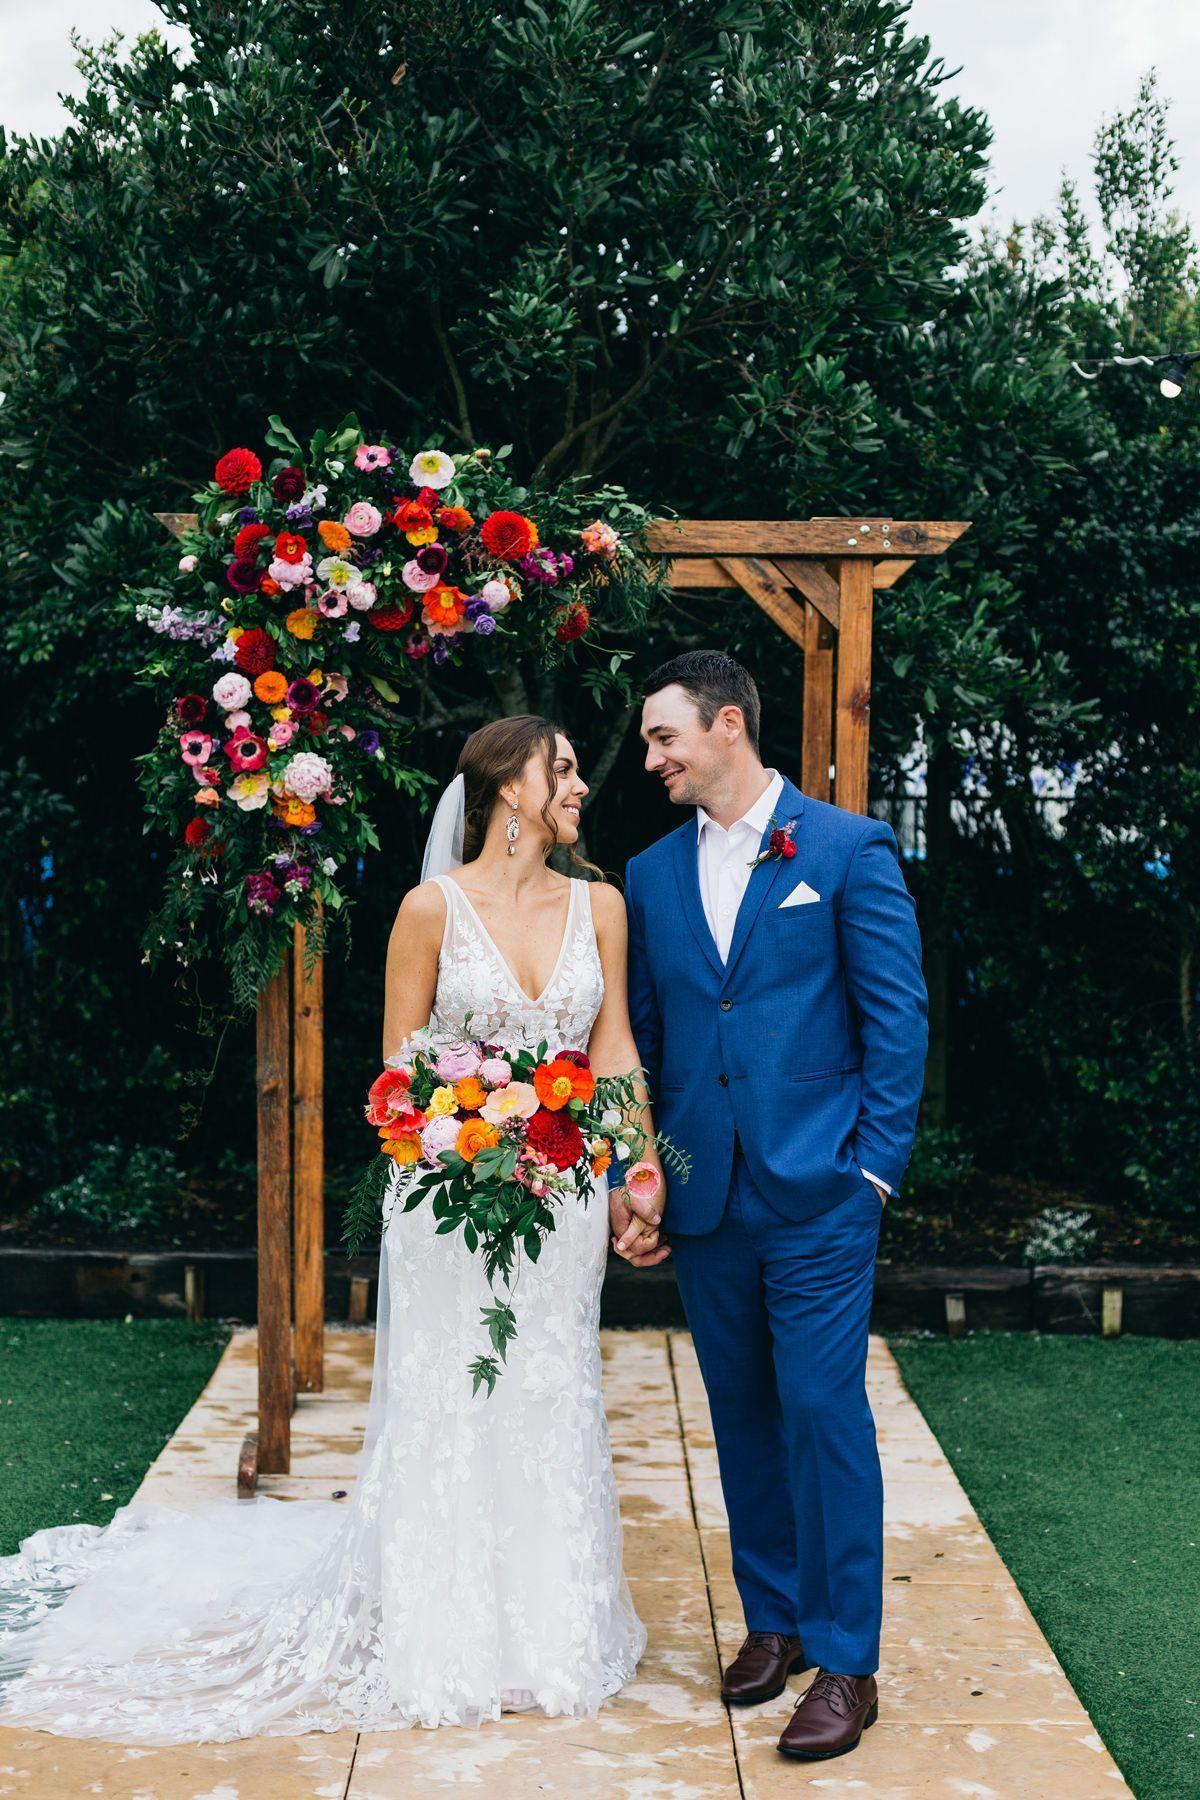 Nicole & Matthew's Bright & Elegant Wedding At Osteria